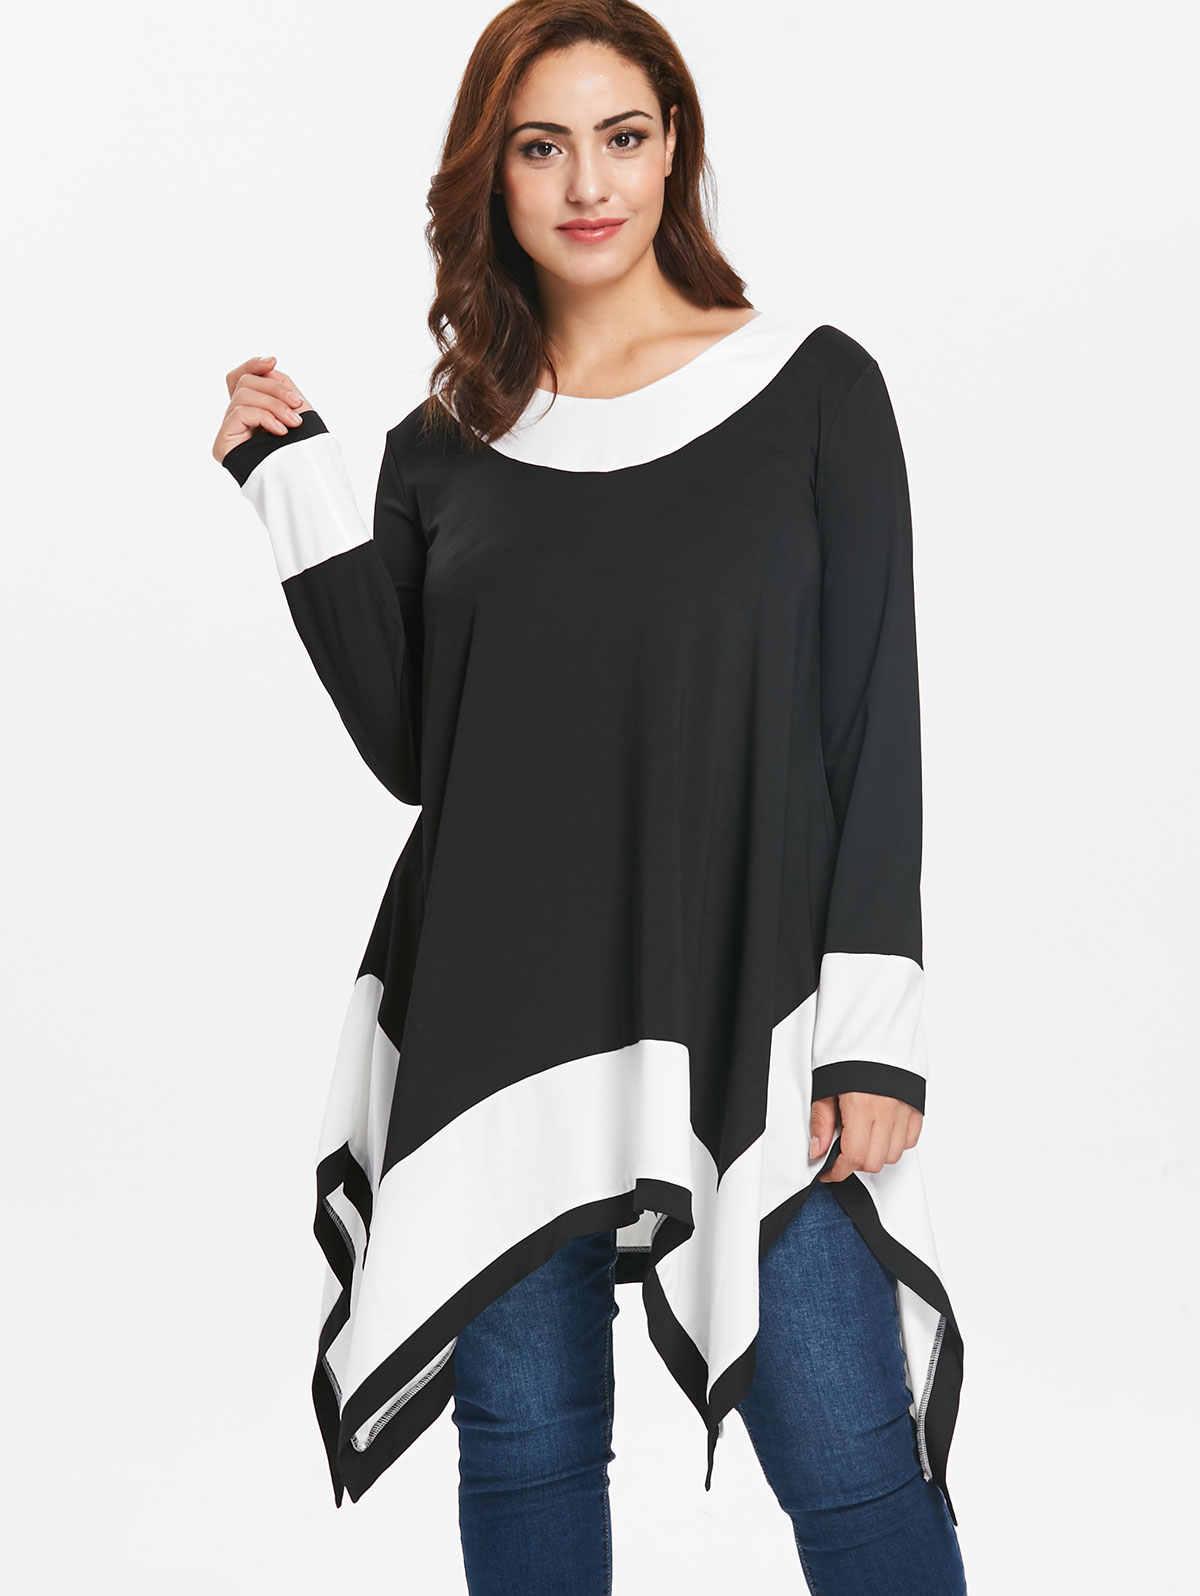 0ce289dd2b787 Wipalo Plus Size 5XL Contrast Long Sleeve Handkerchief T-Shirt Female  Autumn Tunic T-